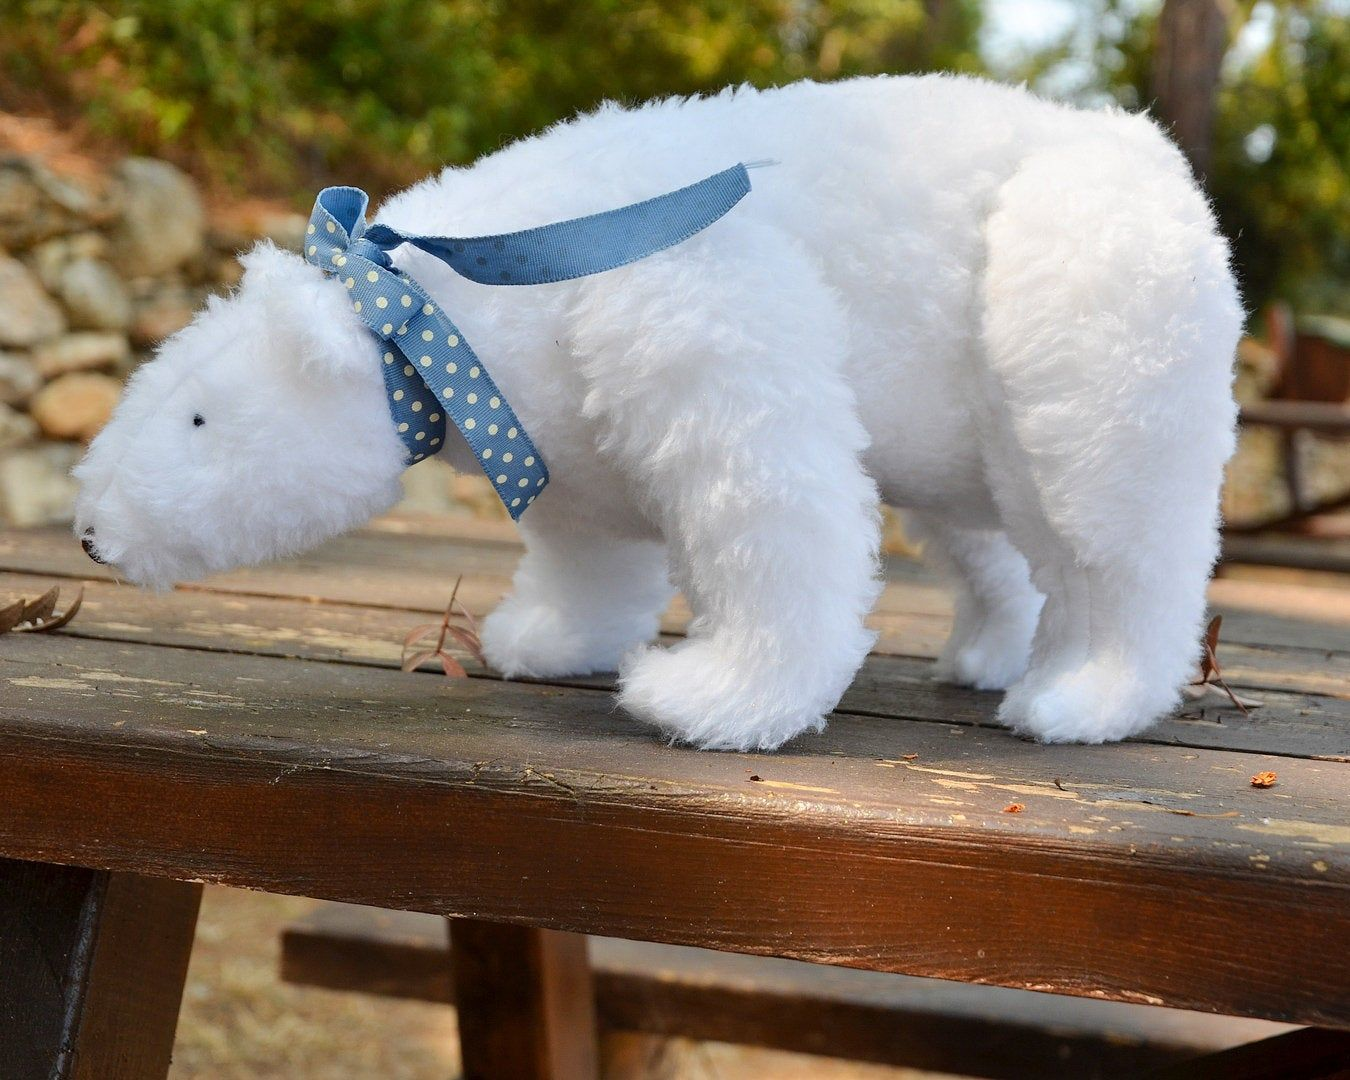 Polar bear plush toy / Christmas gift / Tilda dolls / Teddy bear